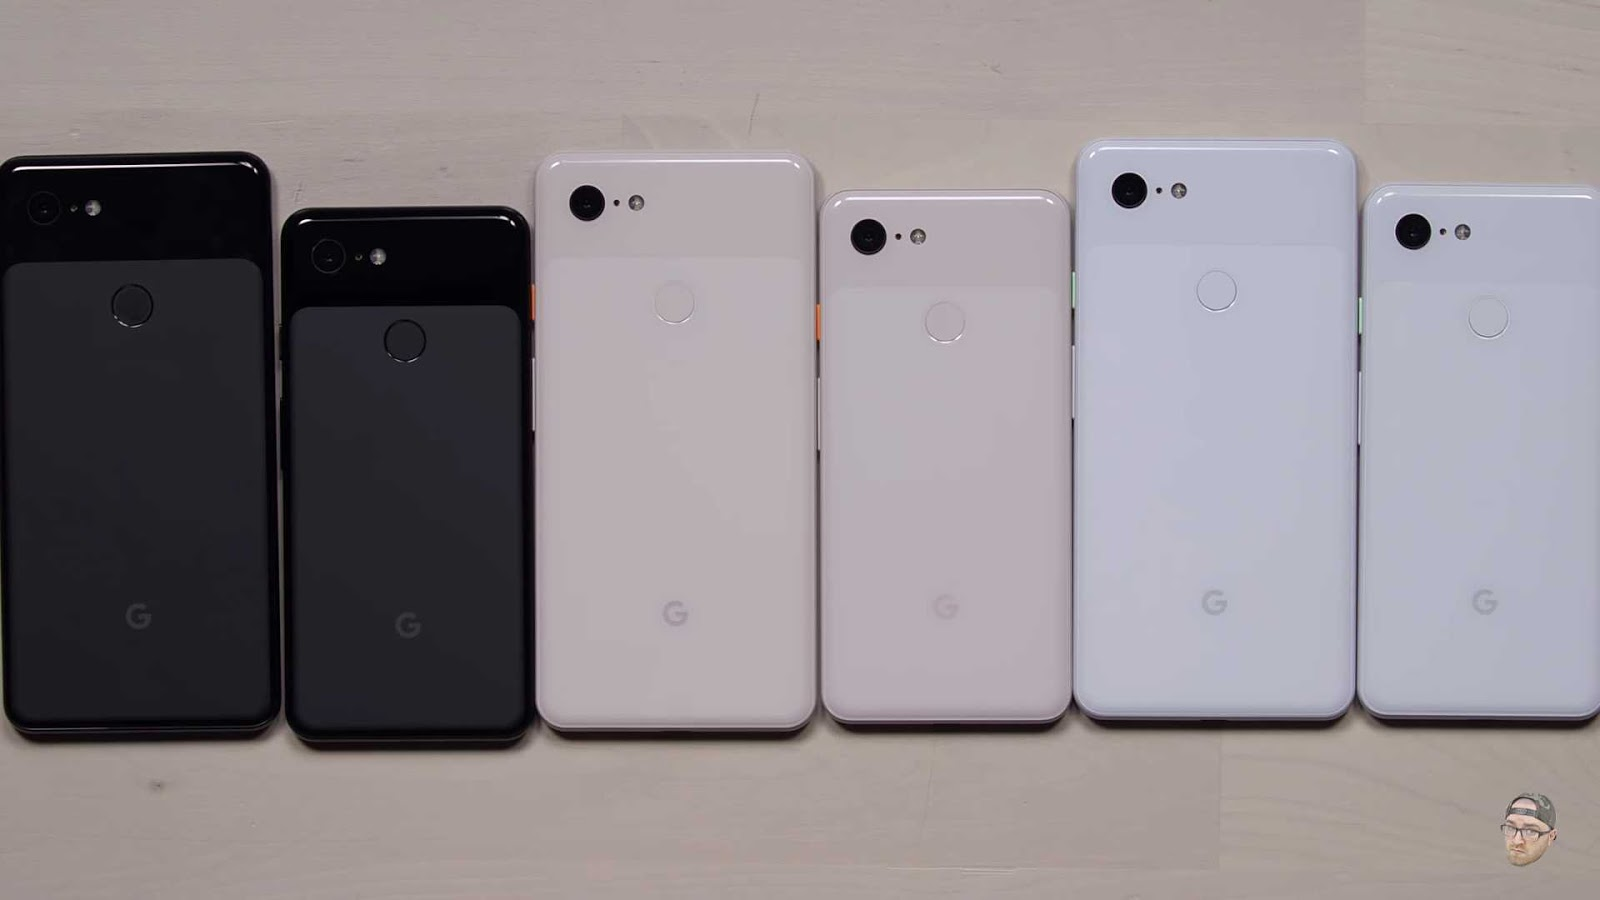 Google Pixel 3 and 3 XL Colors